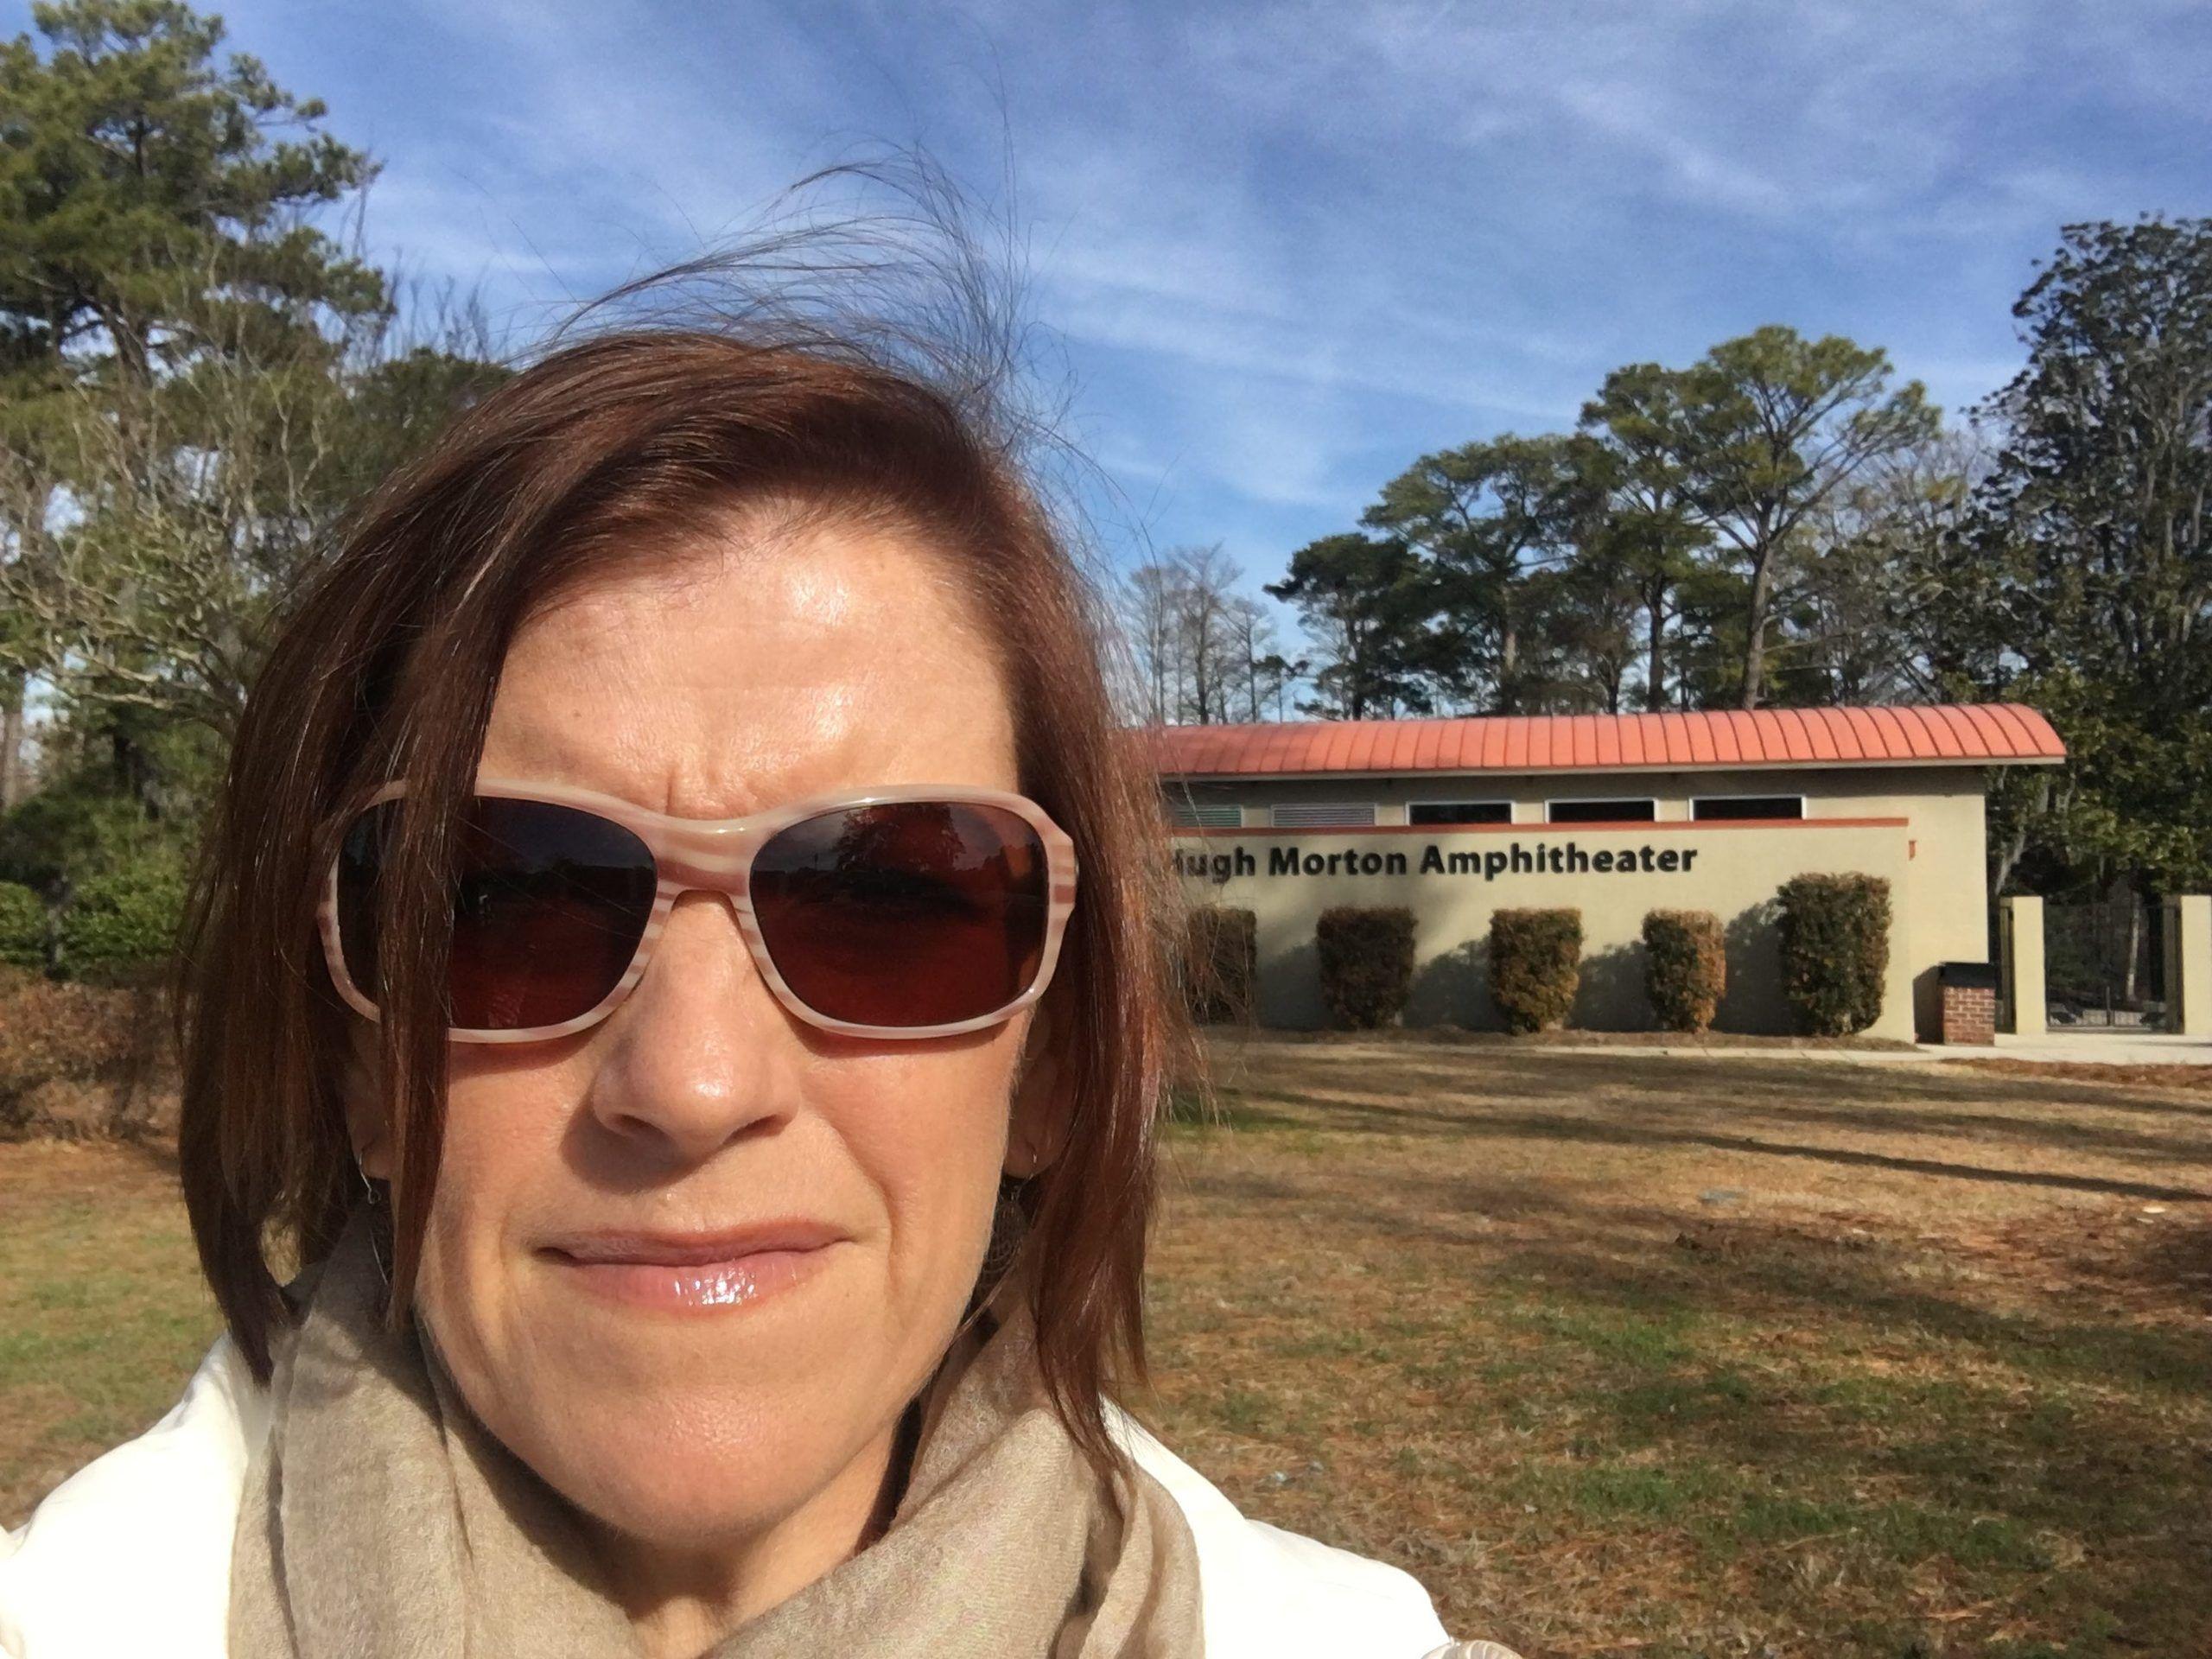 Melanie Cameron at Hugh Morton Amphitheater